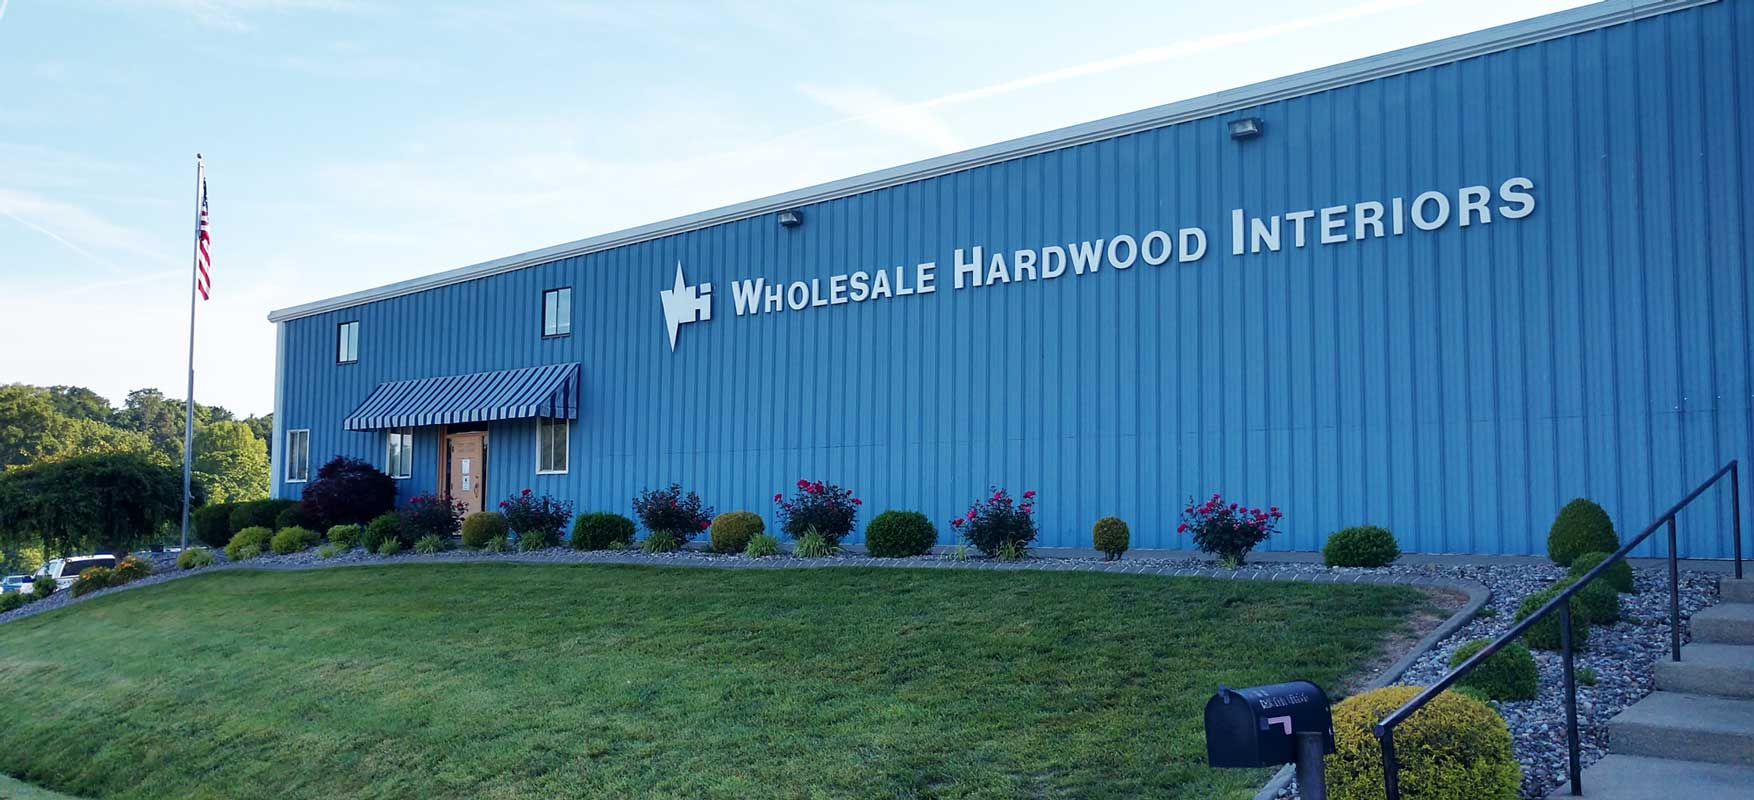 plant wholesale hardwood interiors